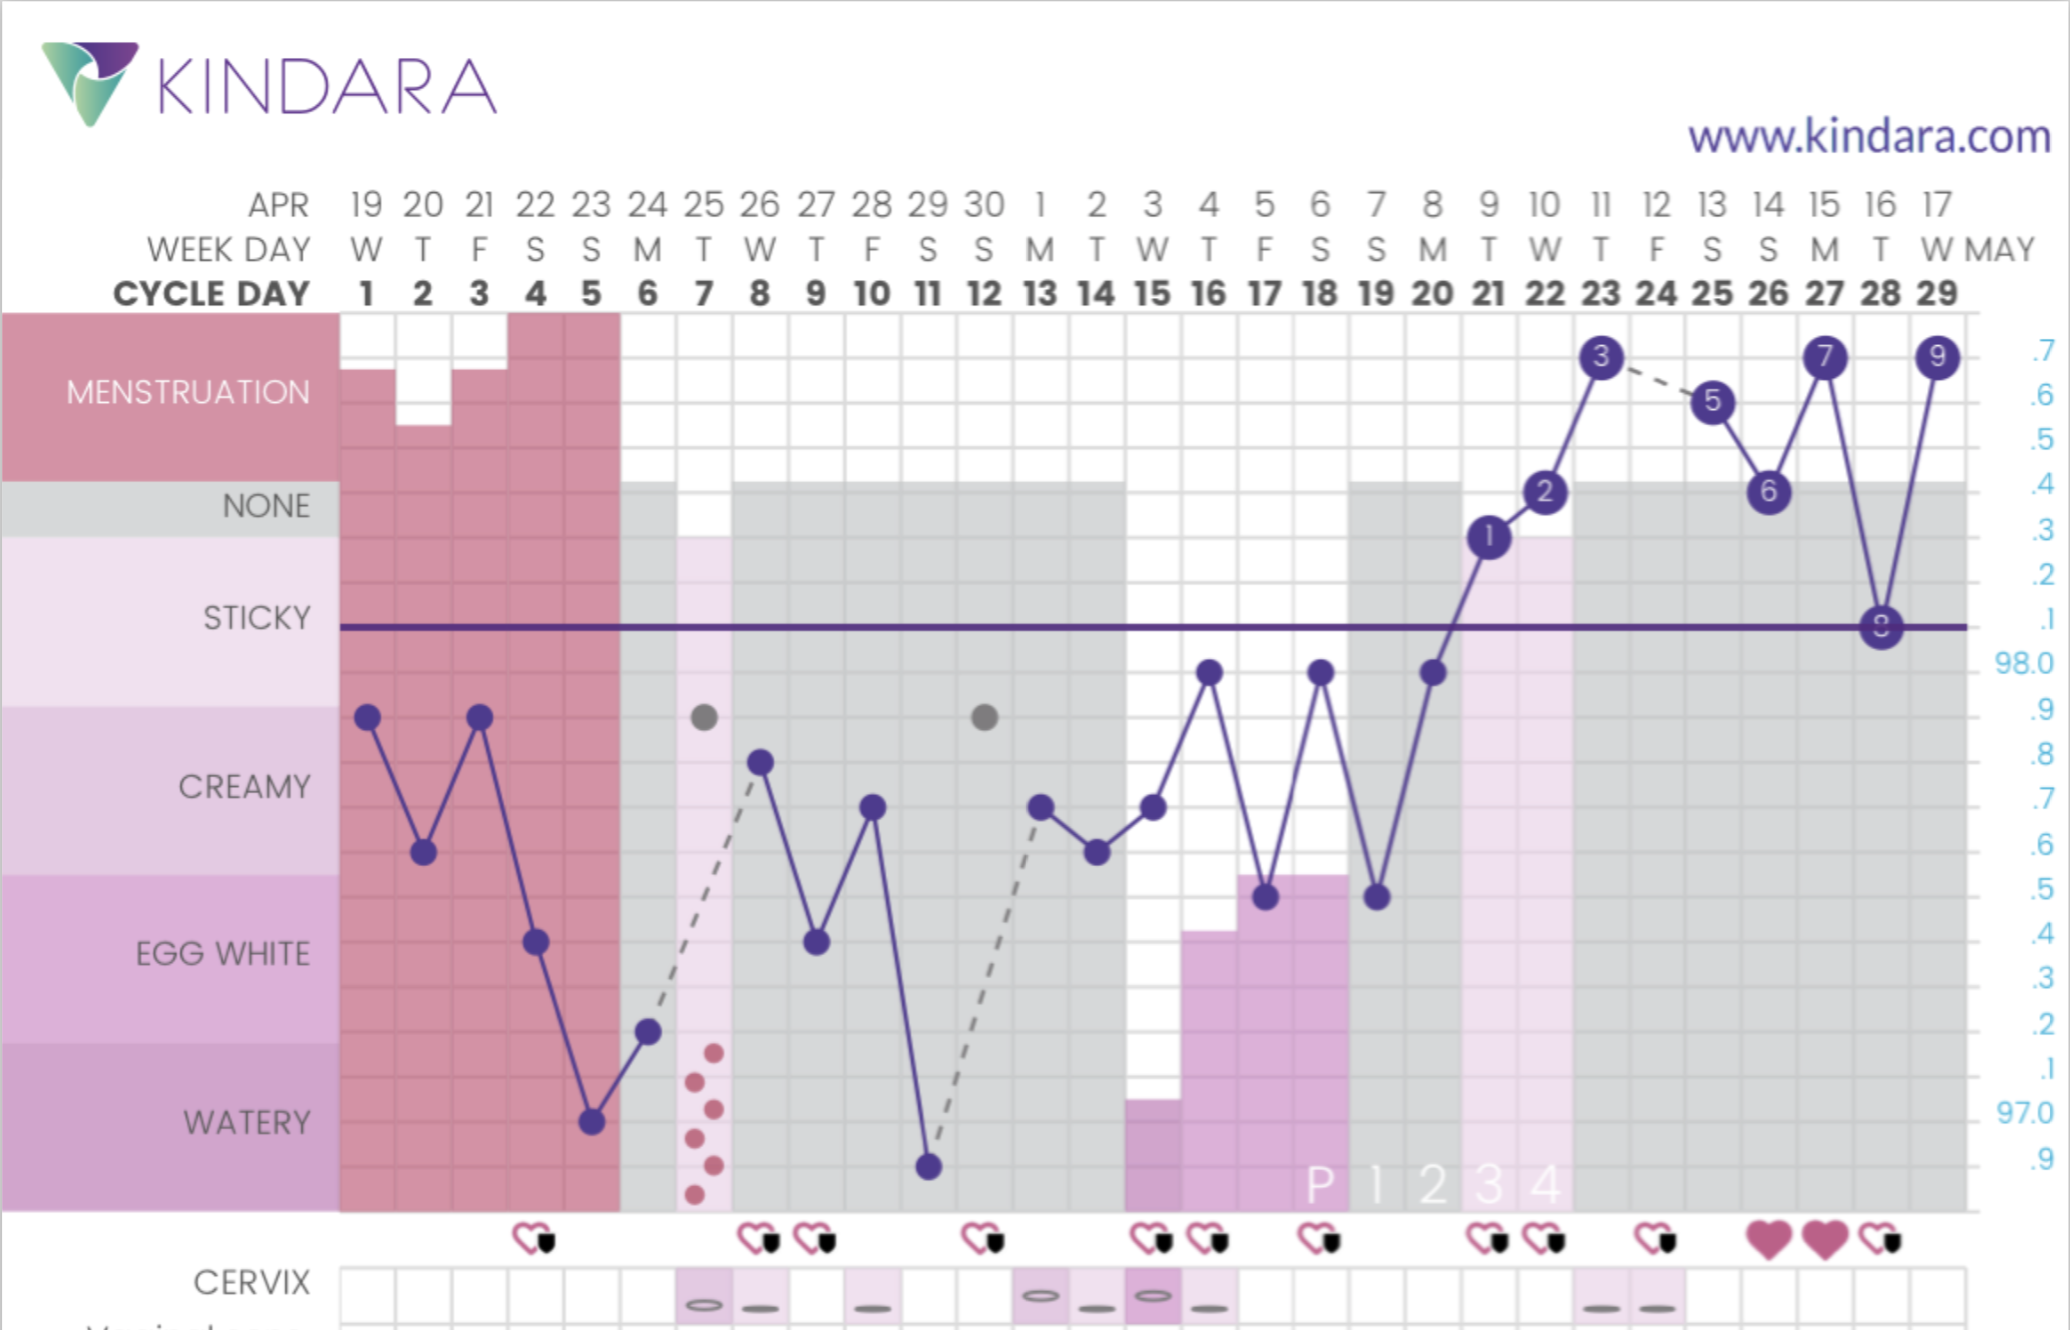 One of my Kindara charts.